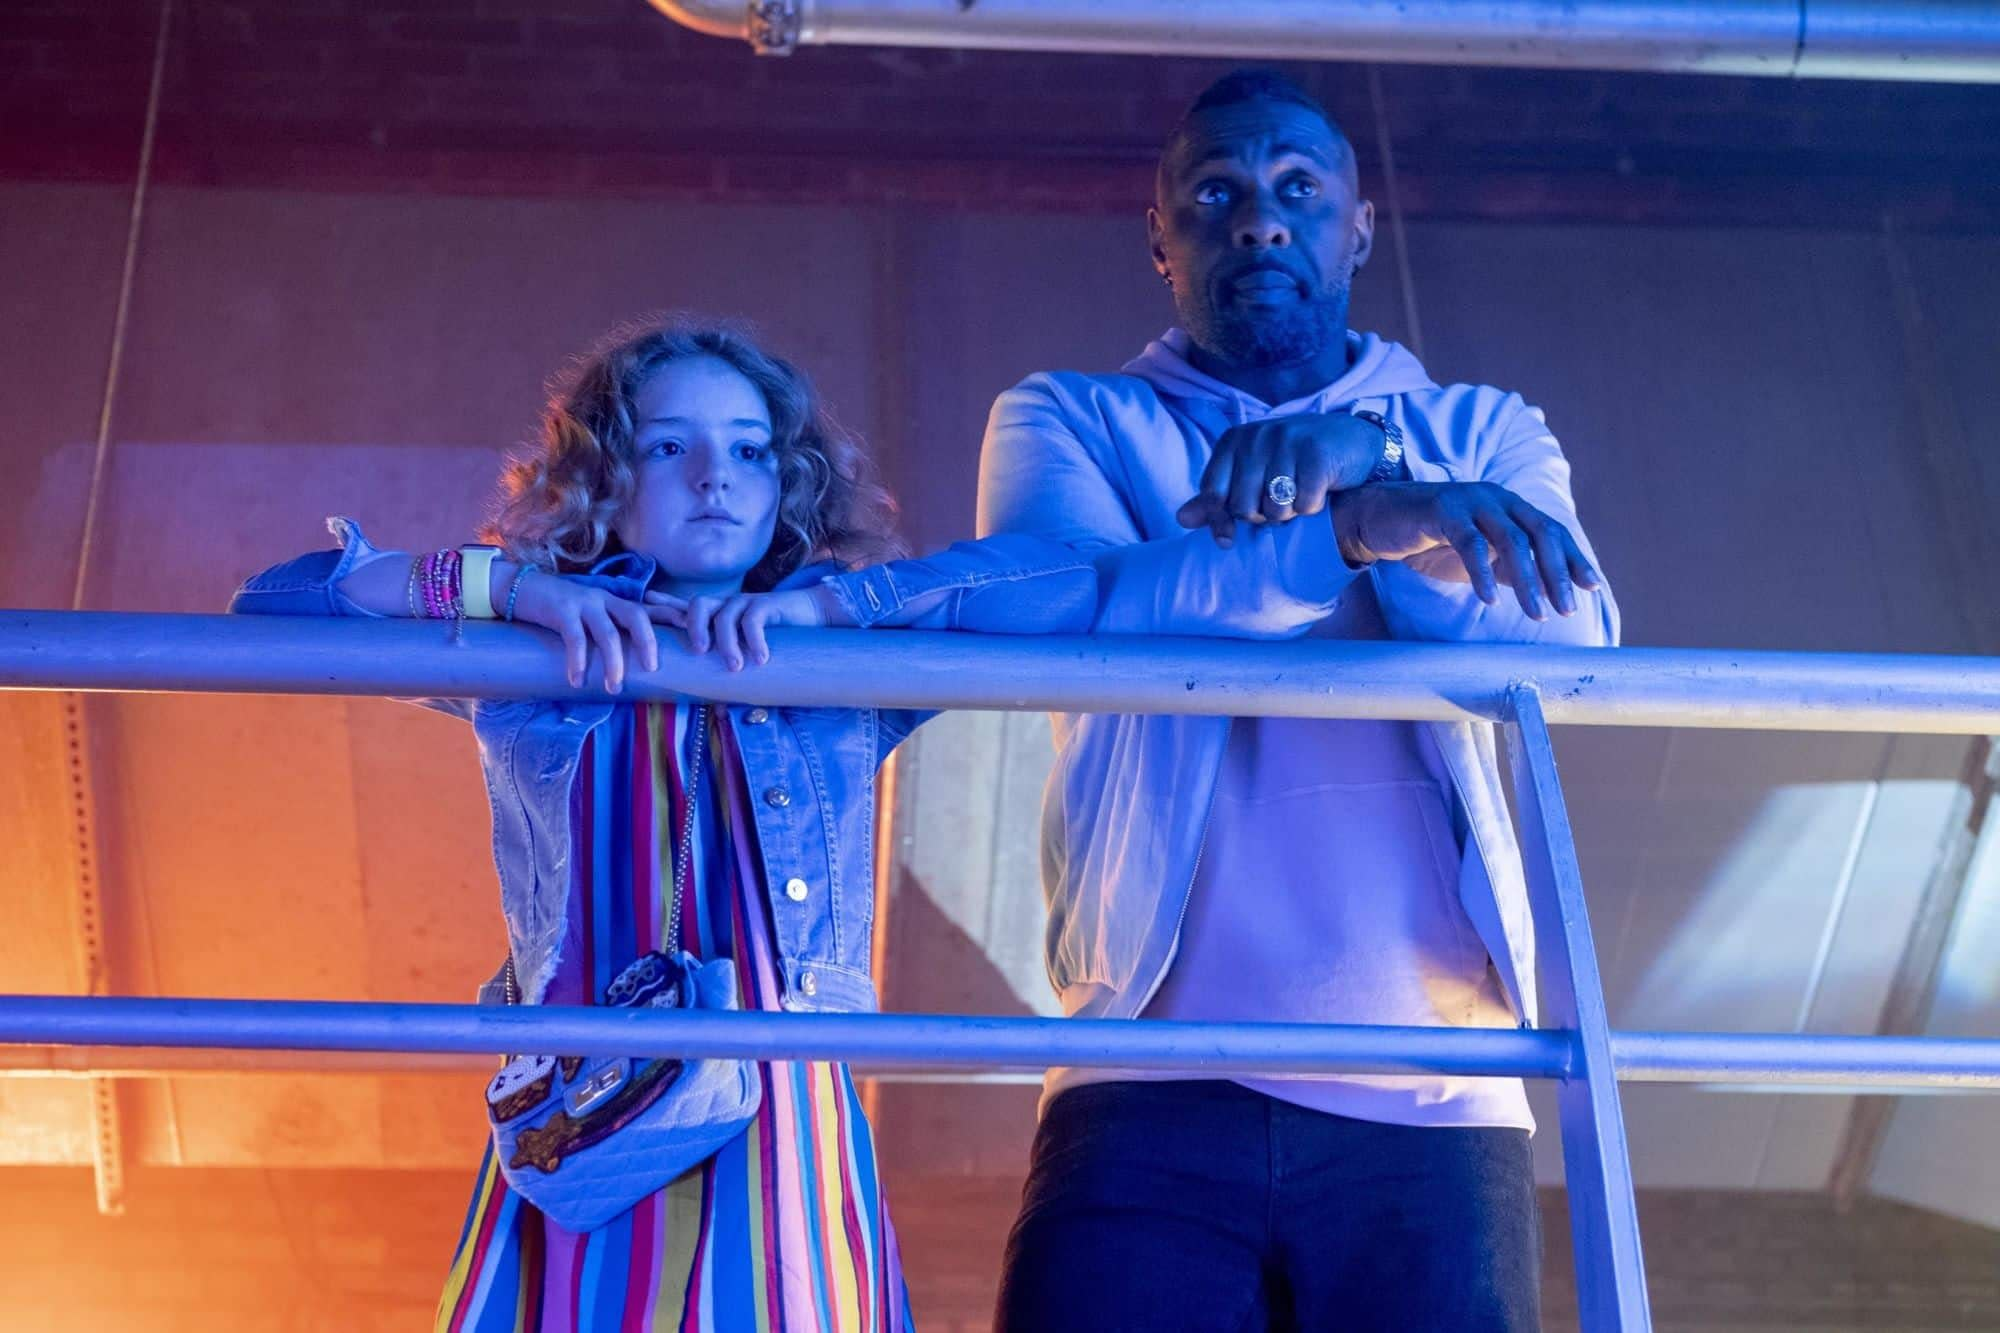 Turn Up Charlie: Idris Elba's DJ Comedy Series Gets First-Look Photos